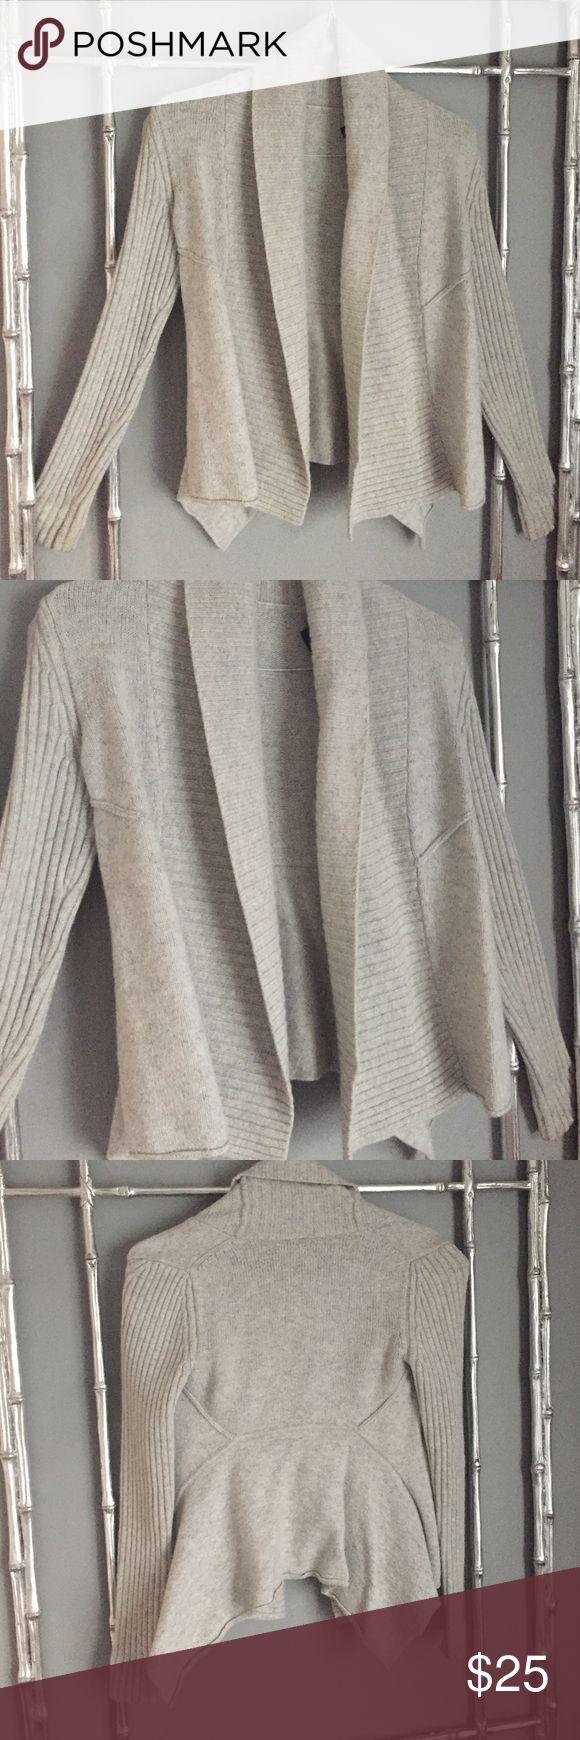 Armani Exchange grey cardigan sweater Beautybof a sweater. 48% wool. Asymmetrical style hem. Size small Armani Exchange Sweaters Cardigans